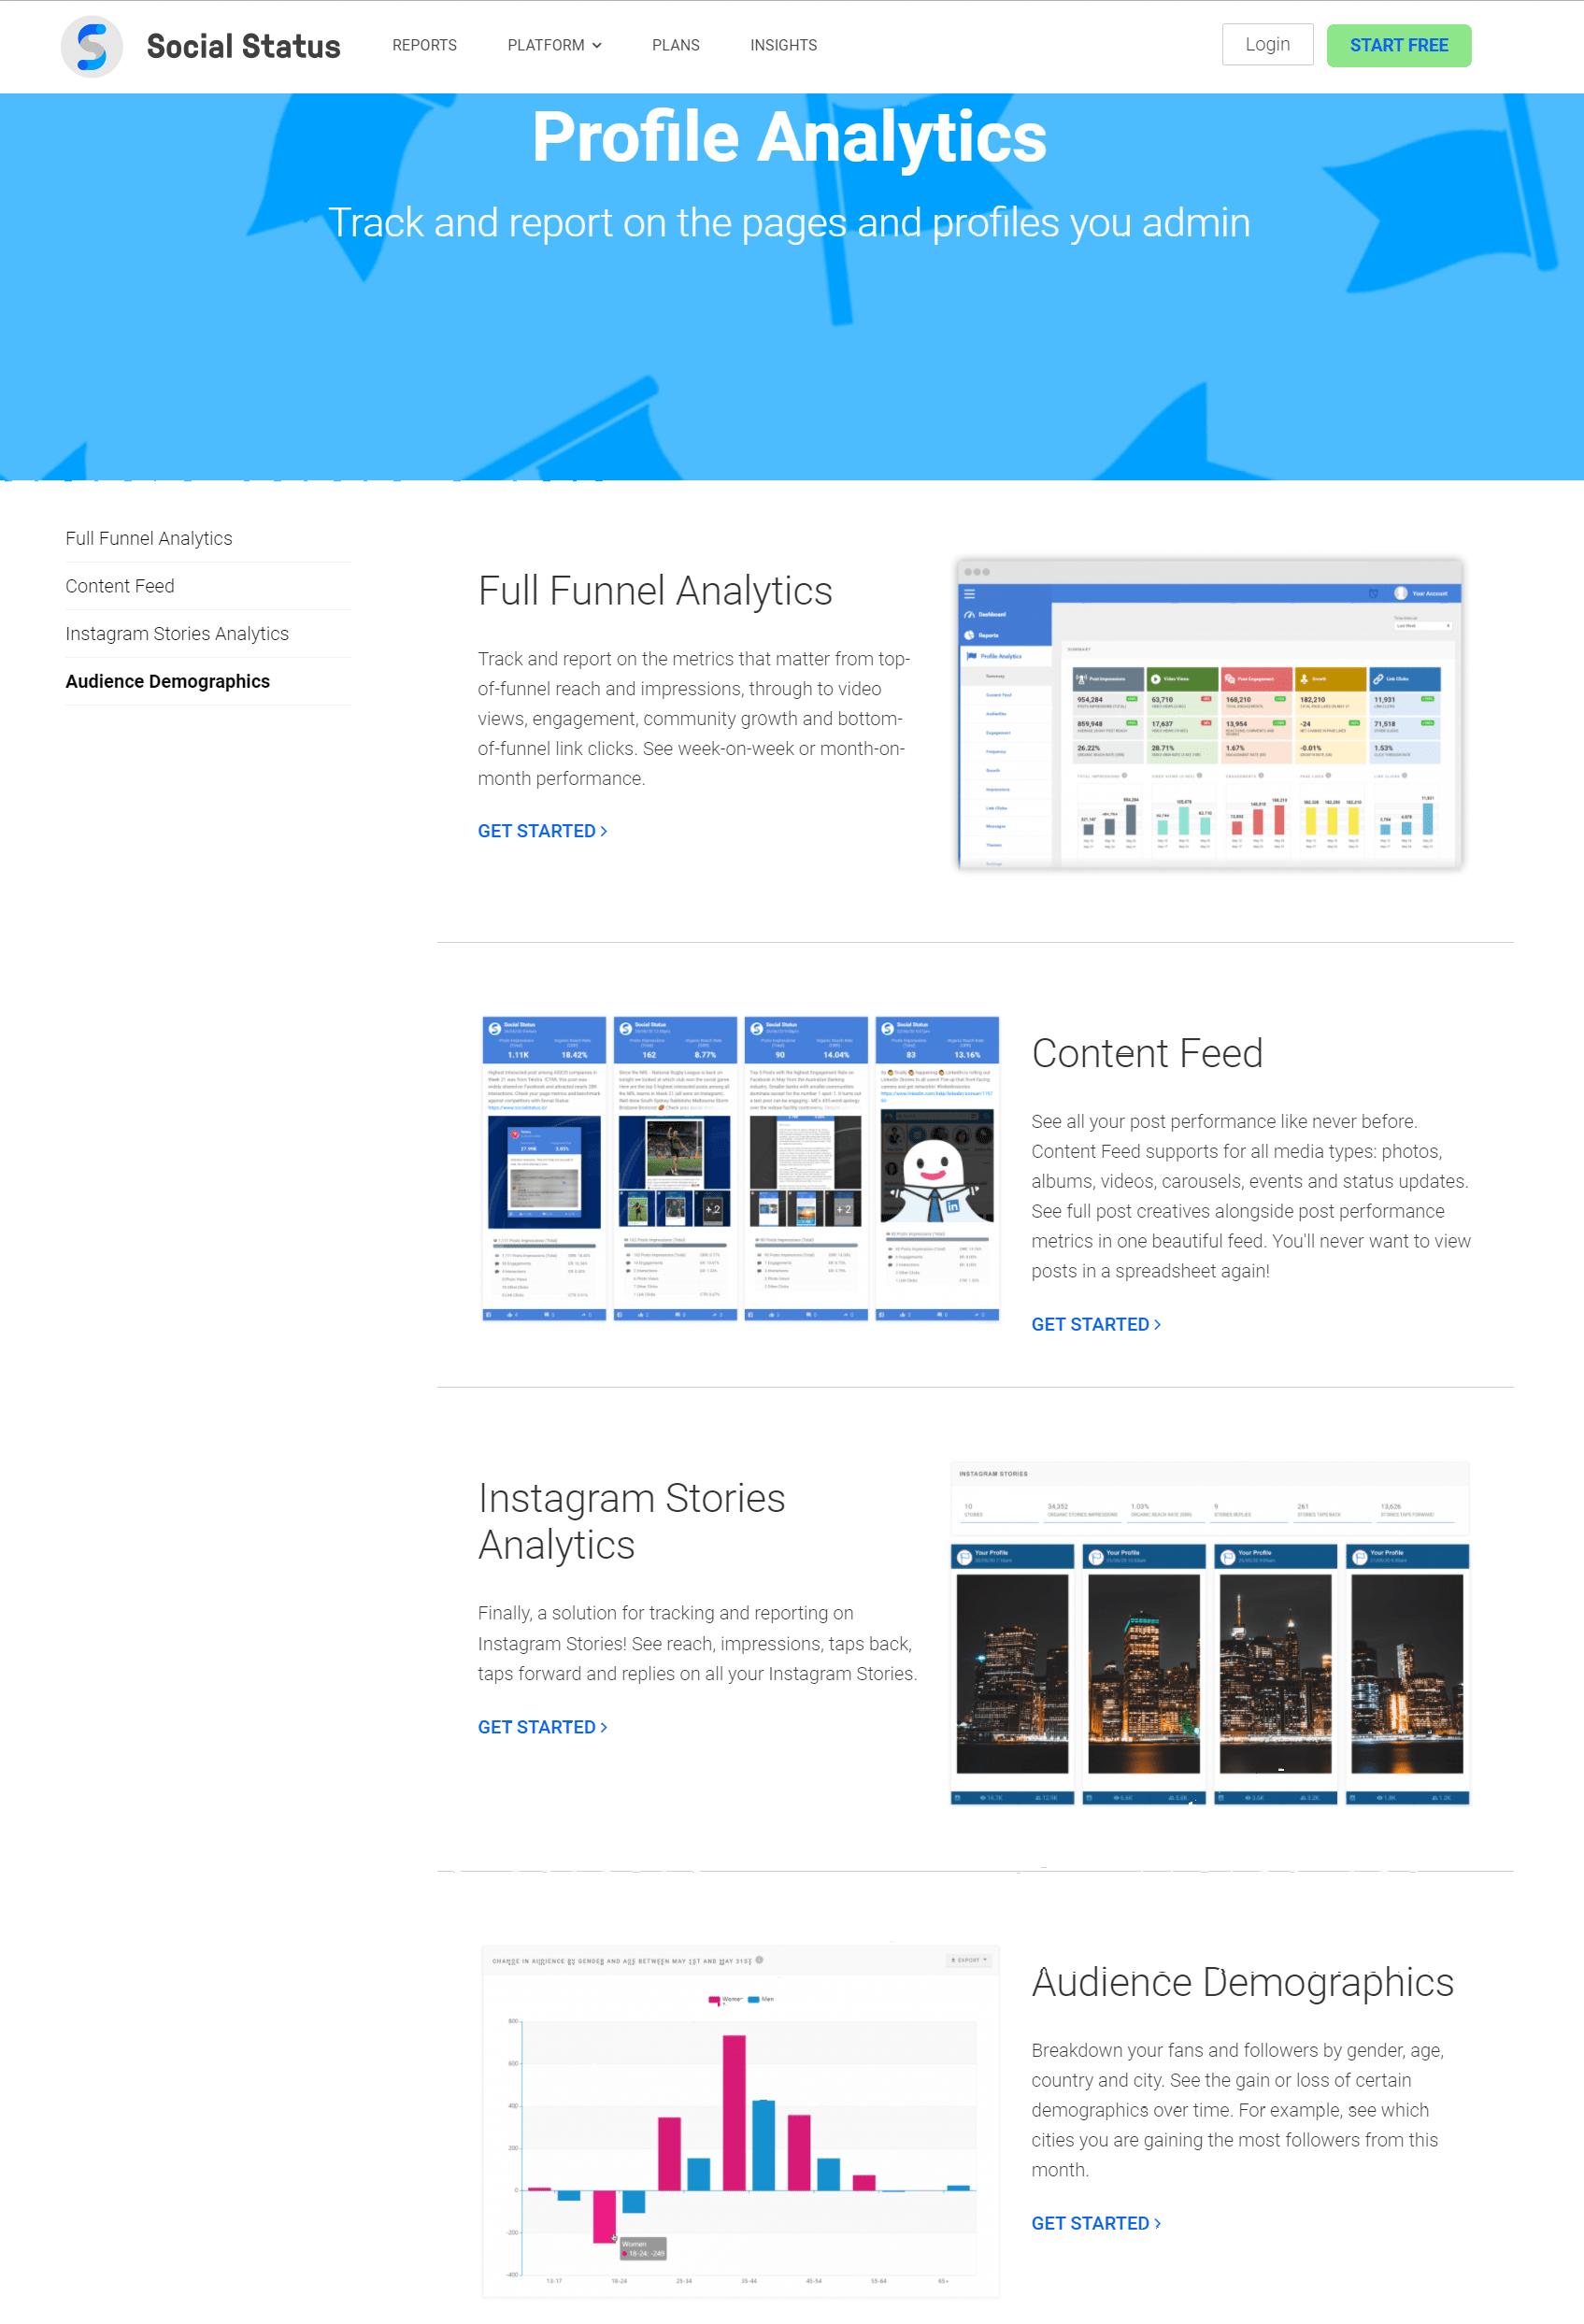 Profile Analytics- Social Status